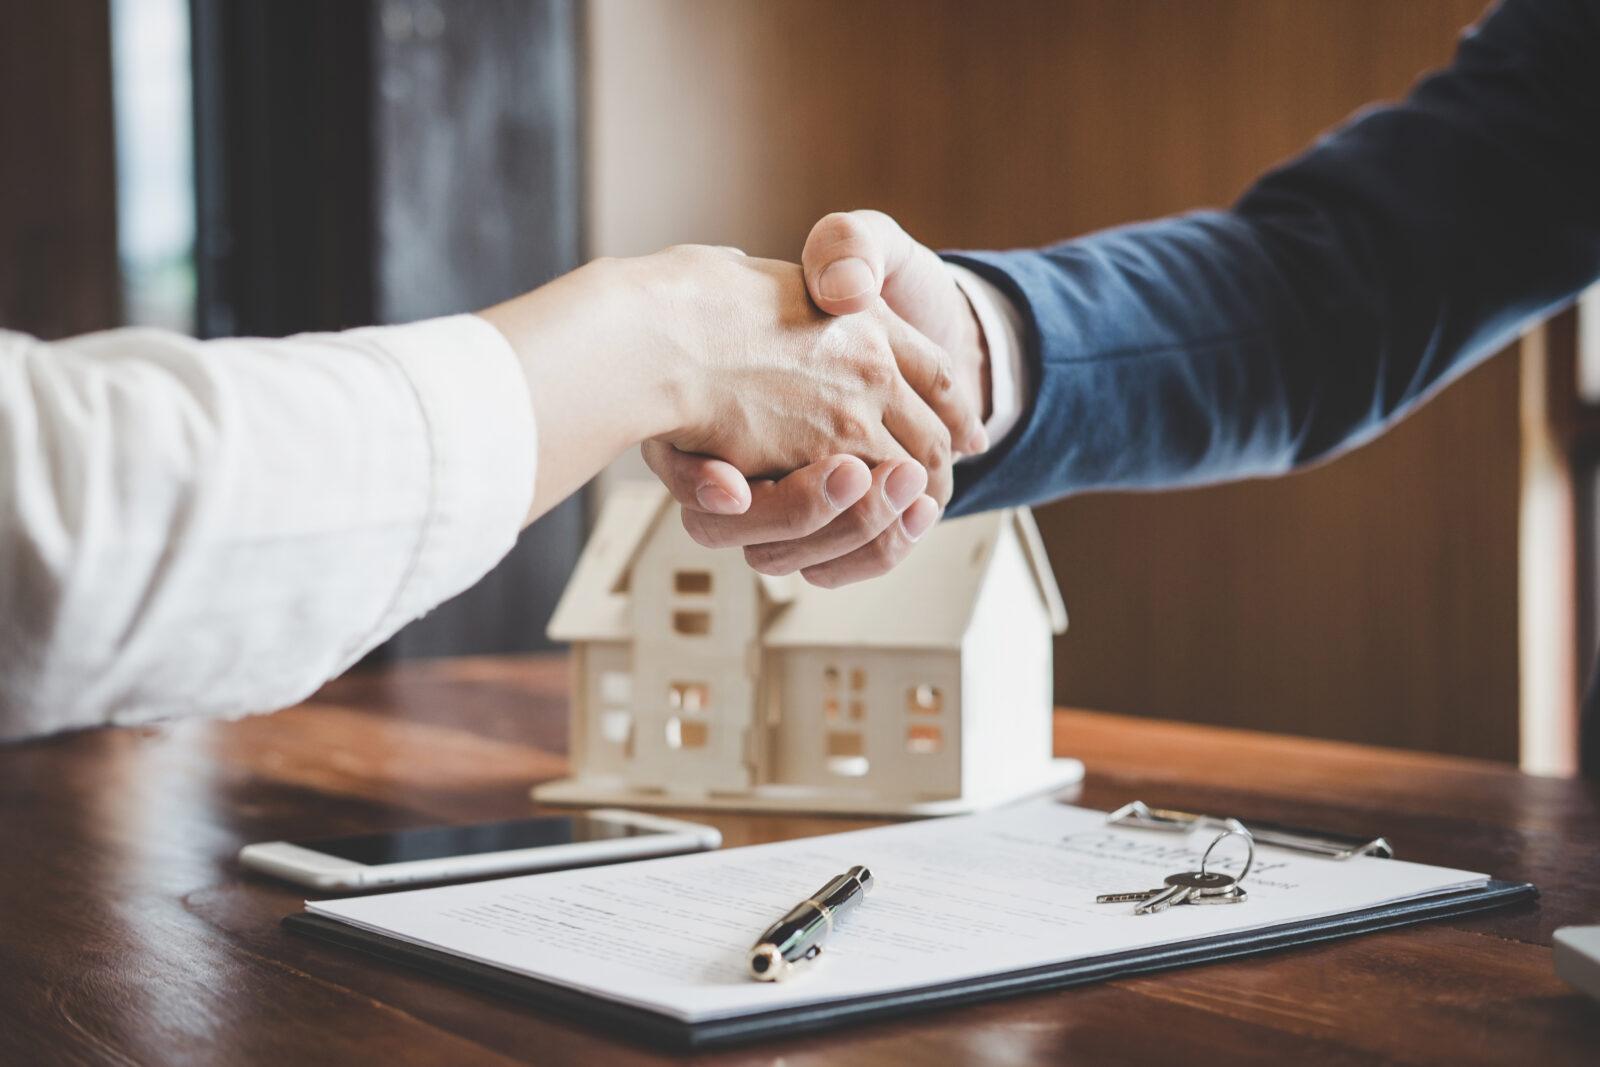 shaking hands over real estate deal